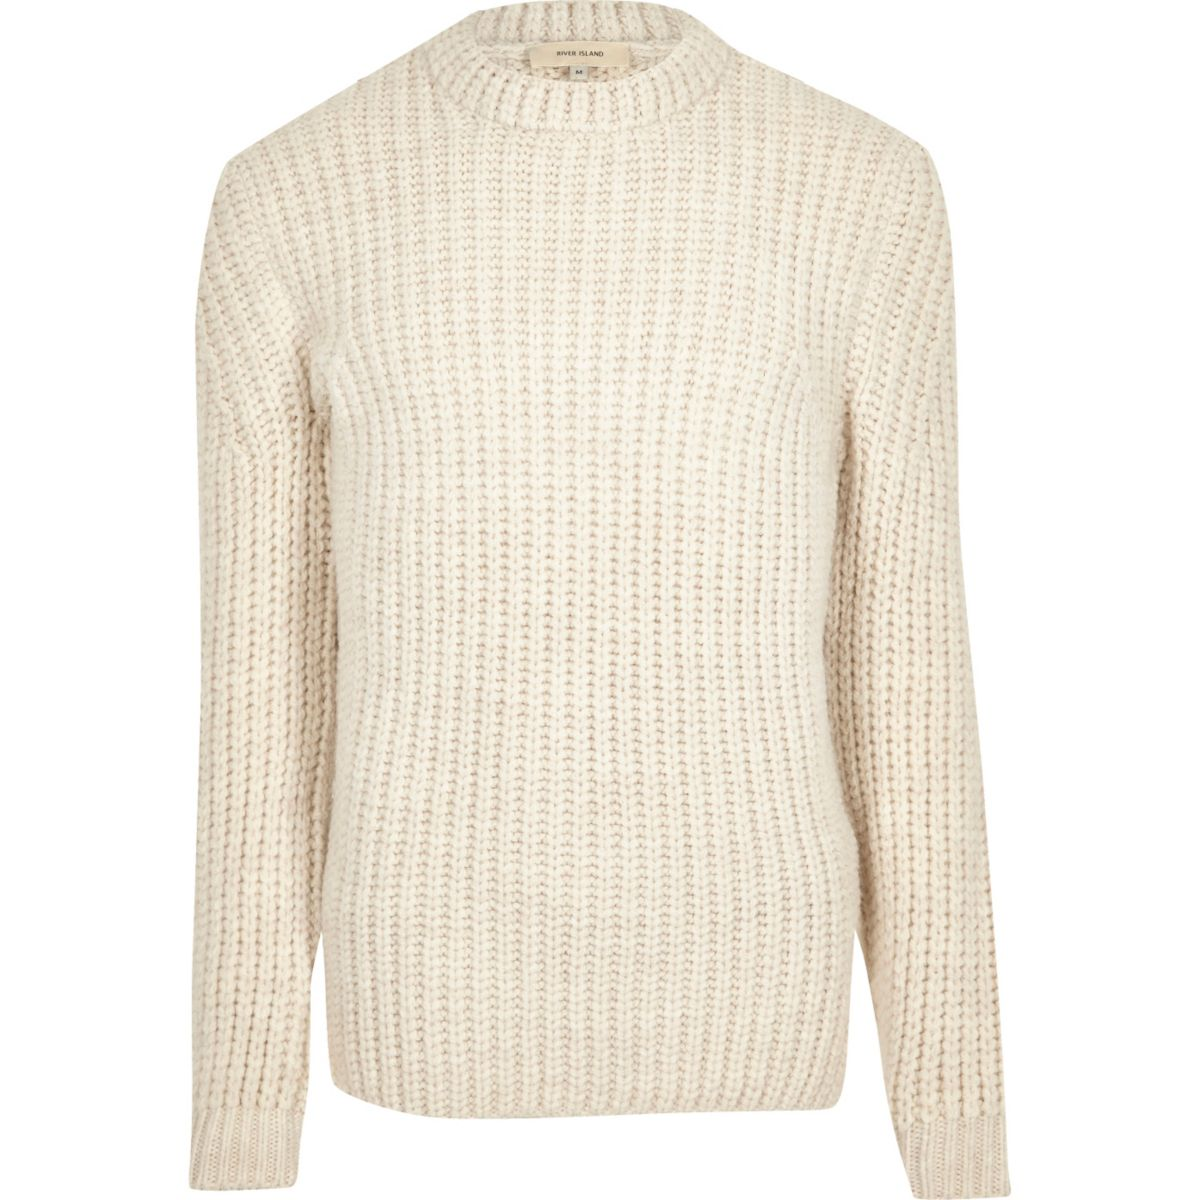 Cream chunky knit jumper